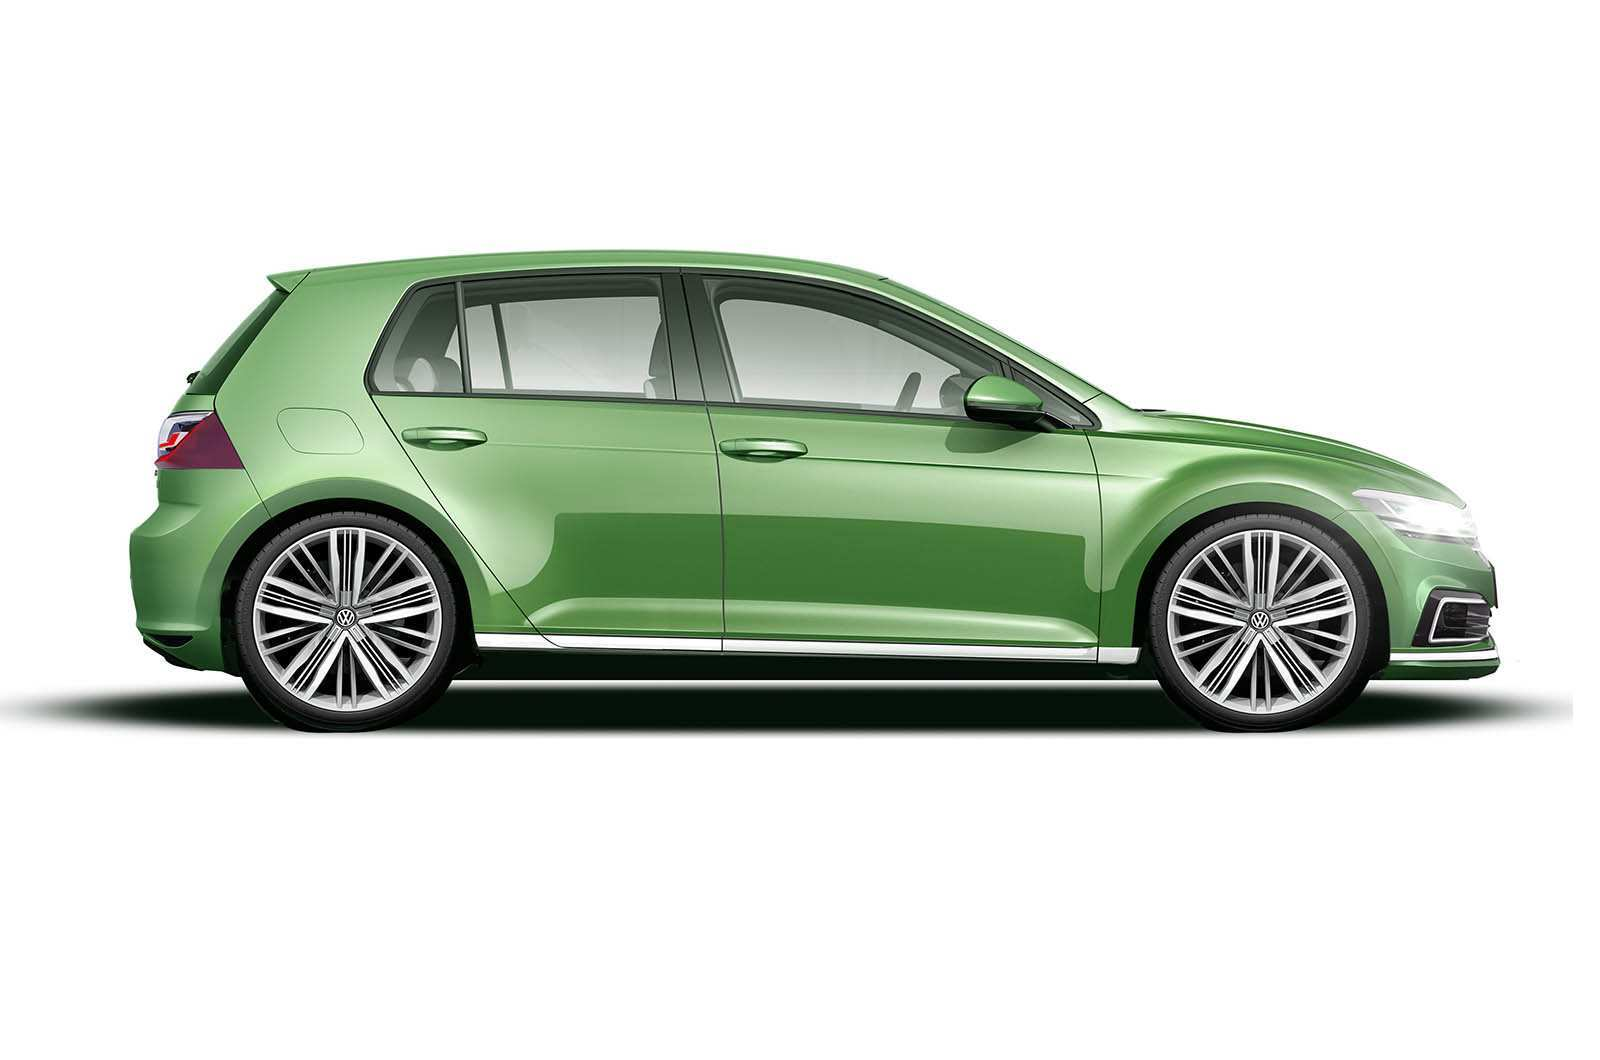 84 New 2020 Volkswagen Gti Speed Test by 2020 Volkswagen Gti